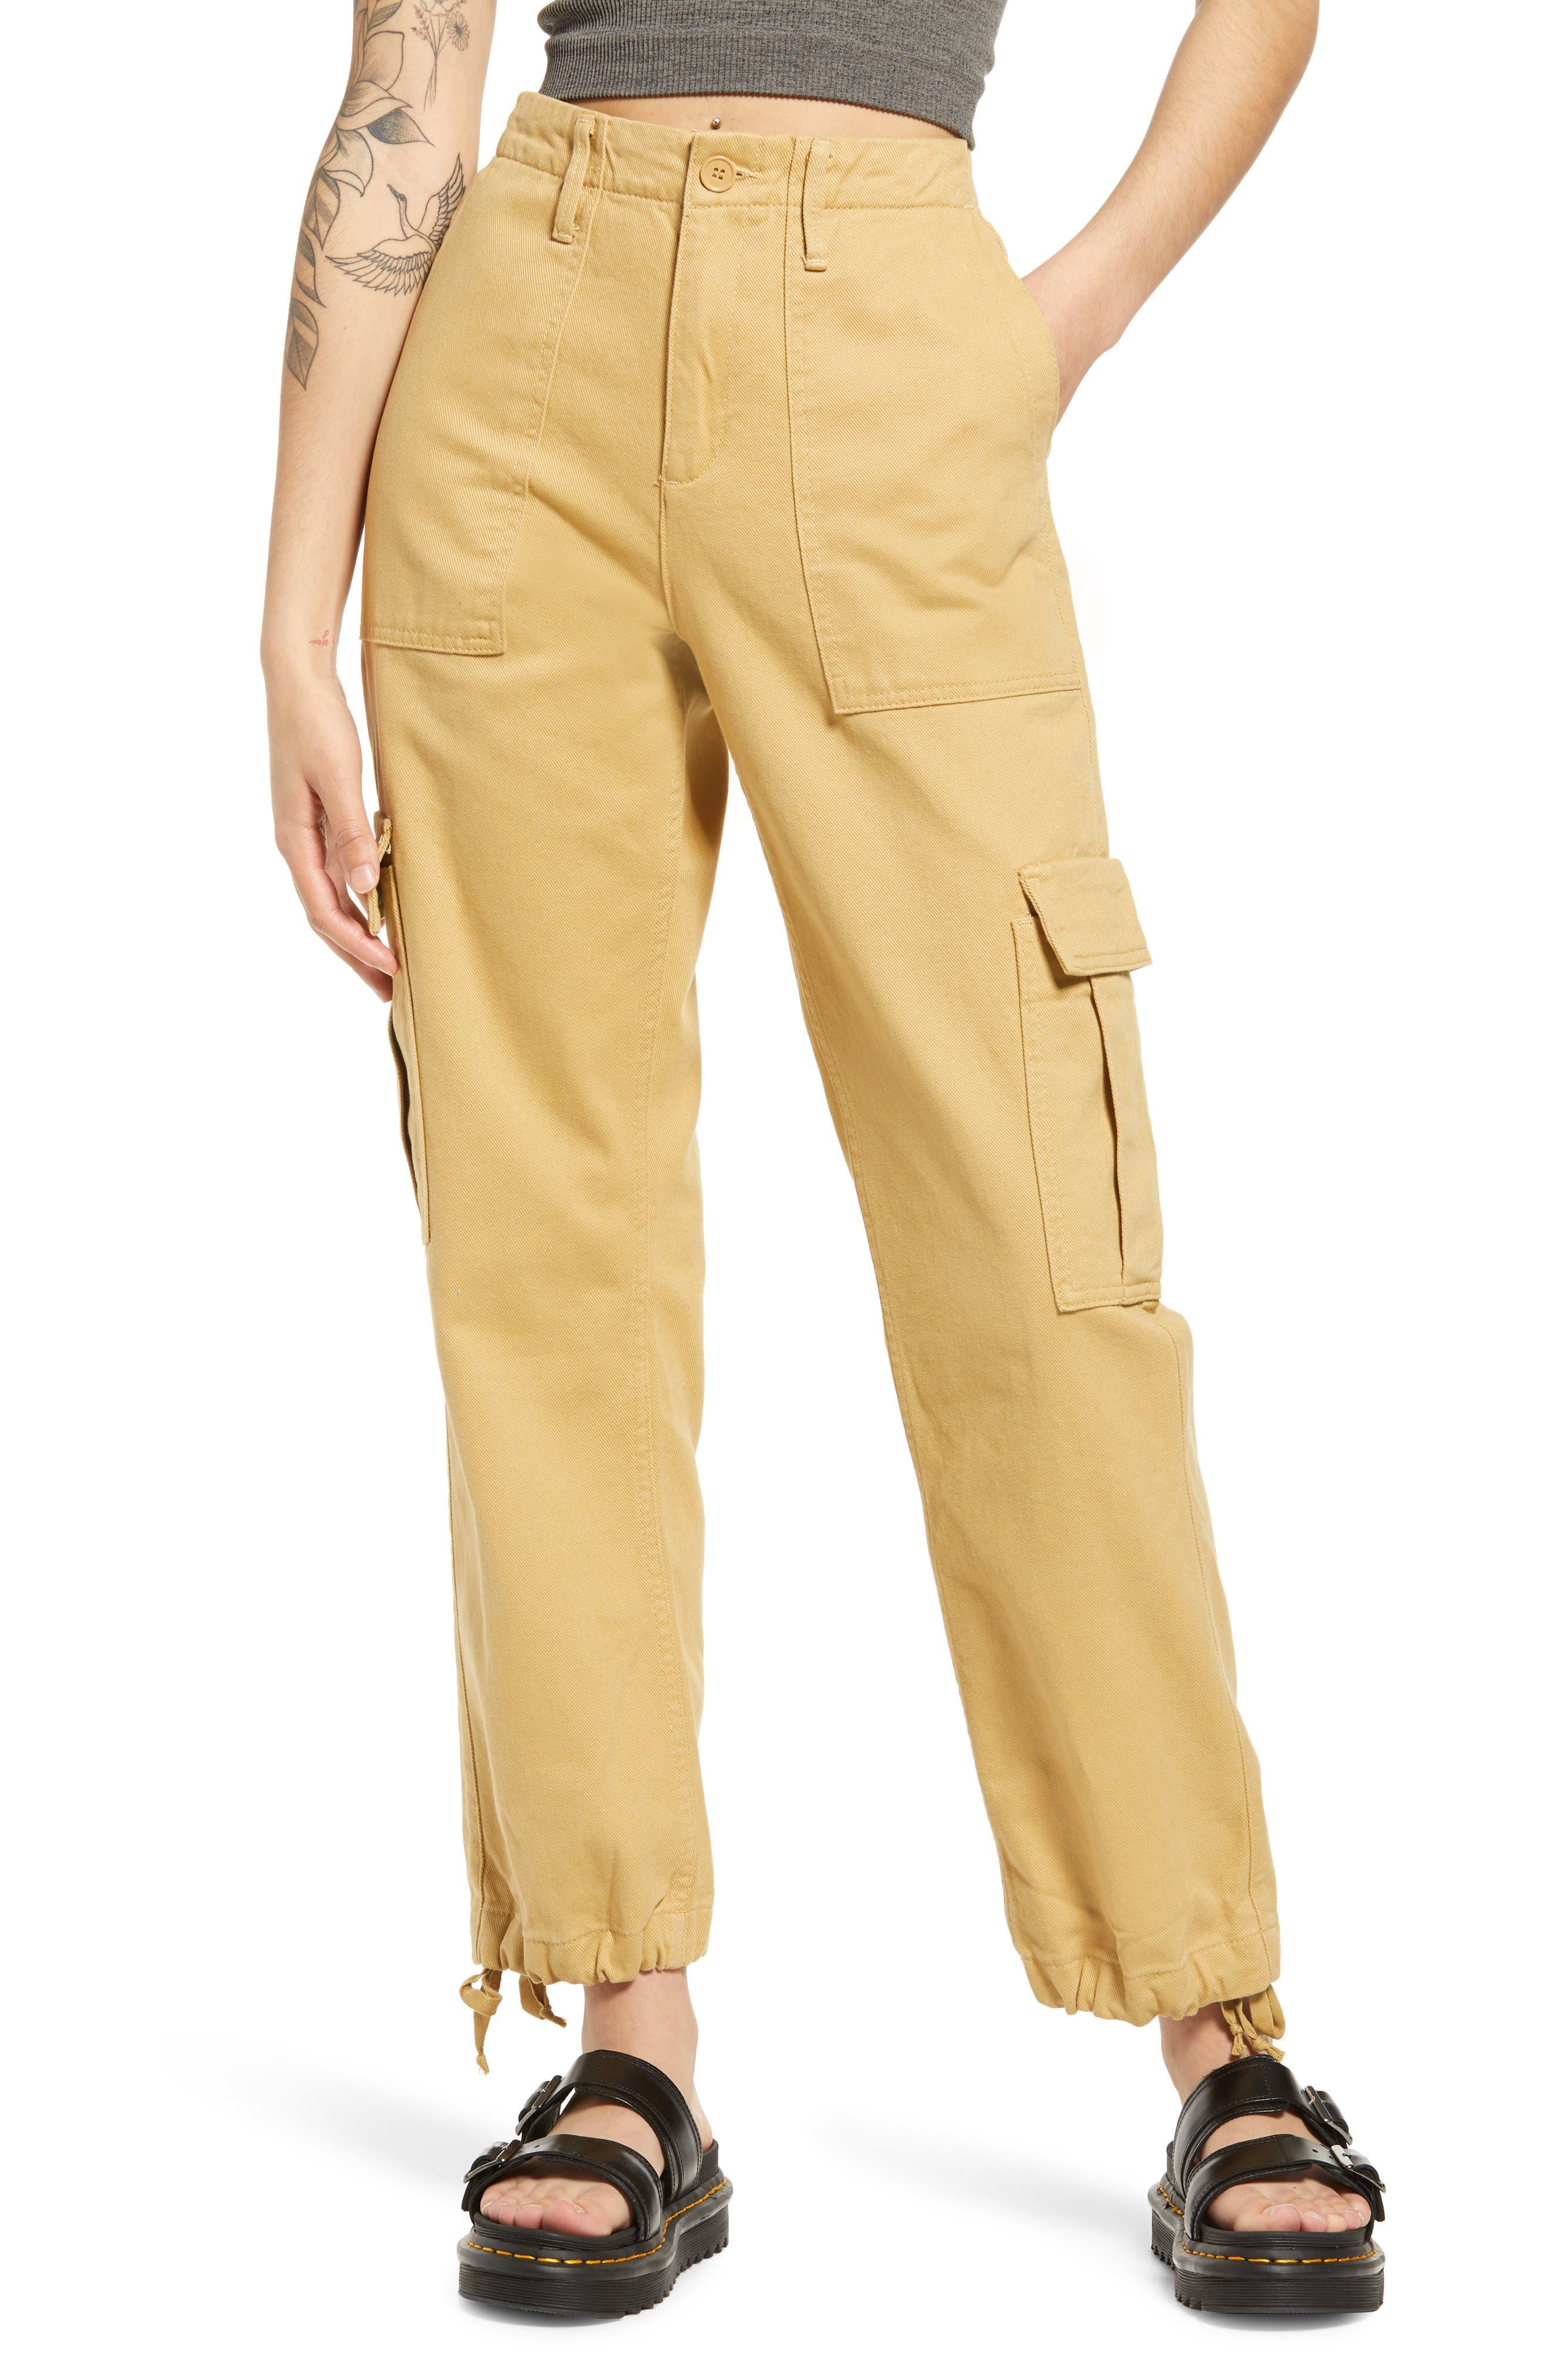 Authentic Cargo Pants